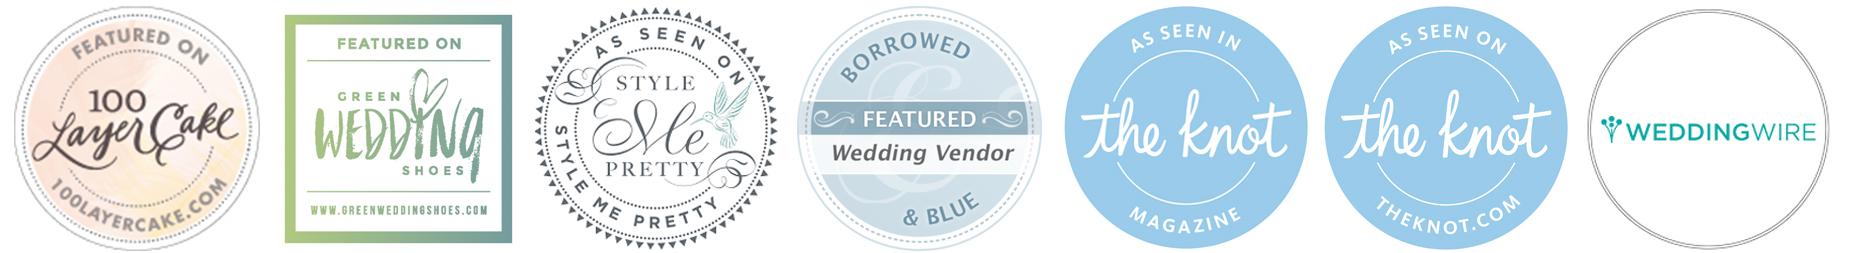 philadelphia-wedding-photography-modern-fine-art-100-layer-cake-green-wedding-shoes-style-me-pretty-borrowed-blue.jpg